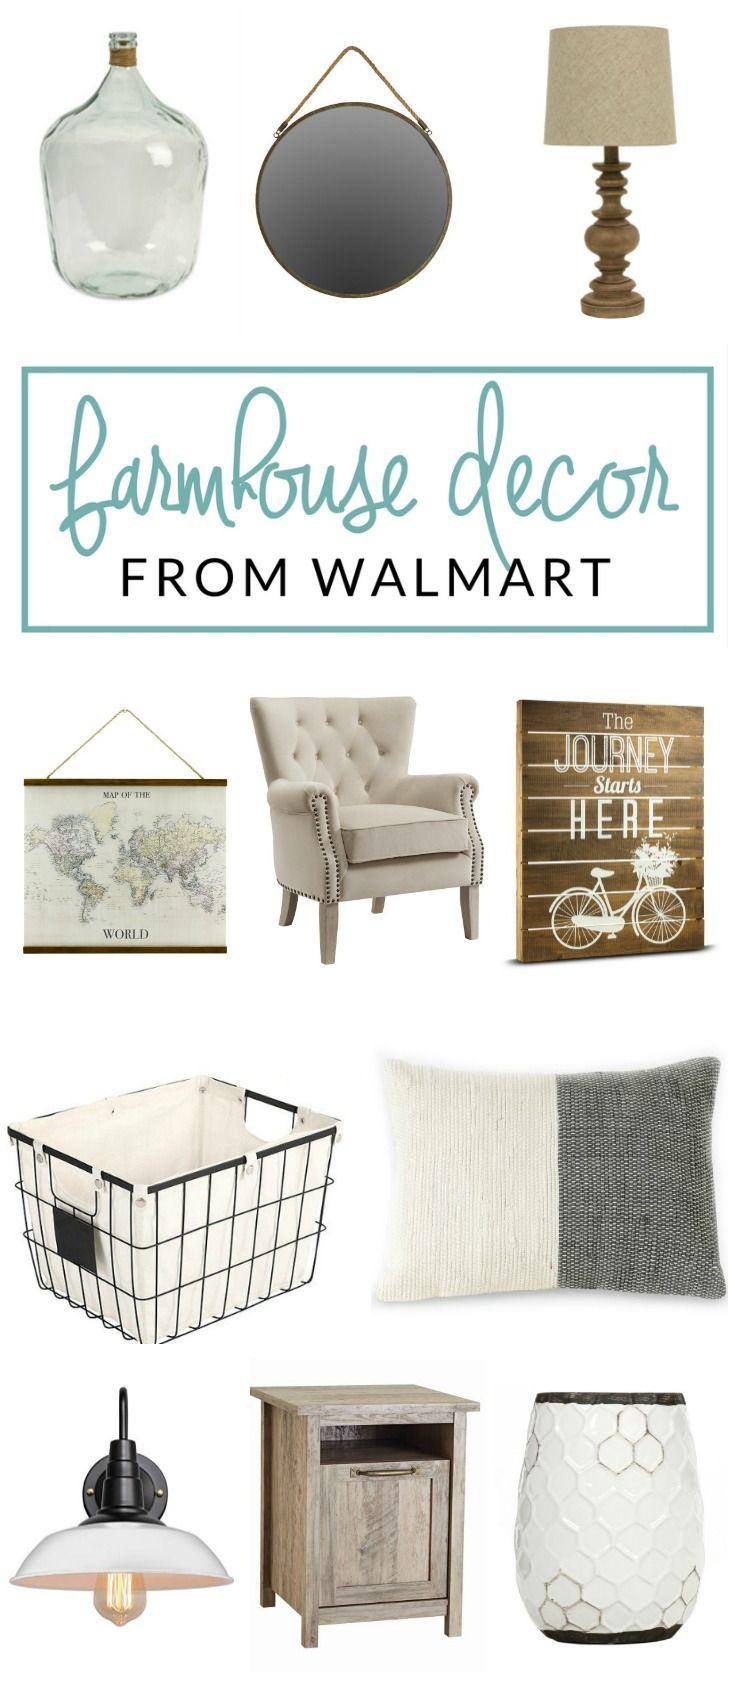 Best 25 Walmart decor ideas on Pinterest